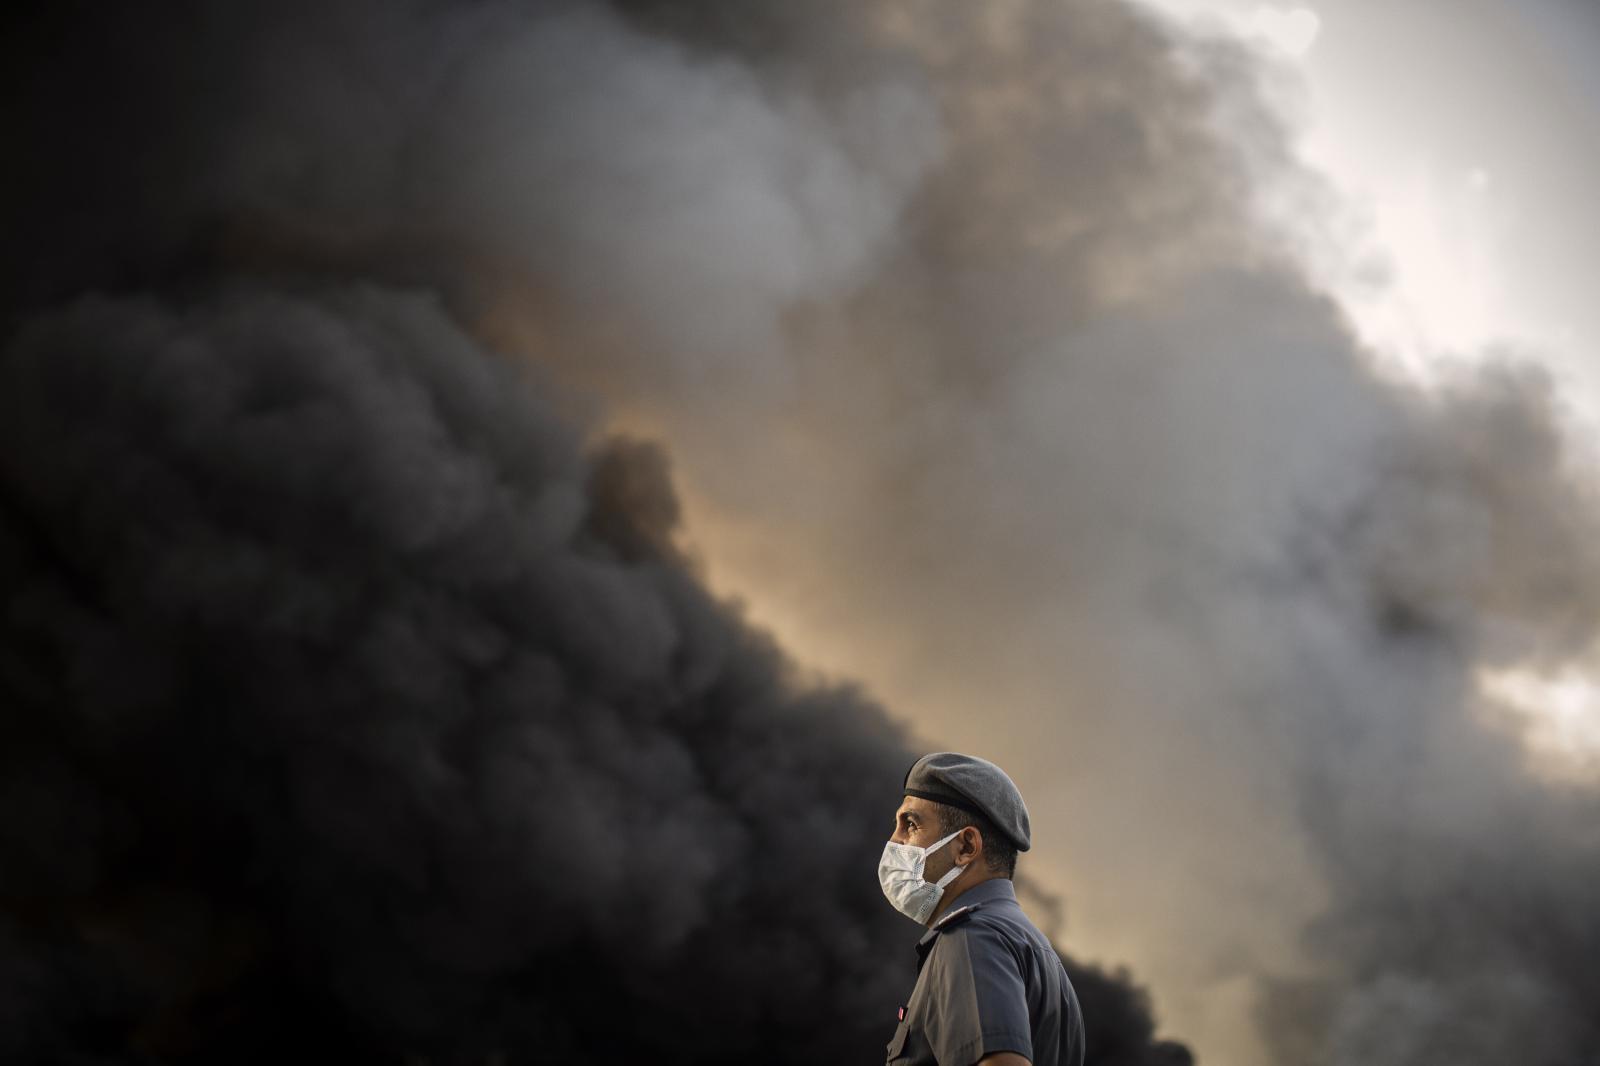 Photography image - Loading 20200910_NYT_BEIRUT_FIRE_DIEGOIBARRA_015.jpg